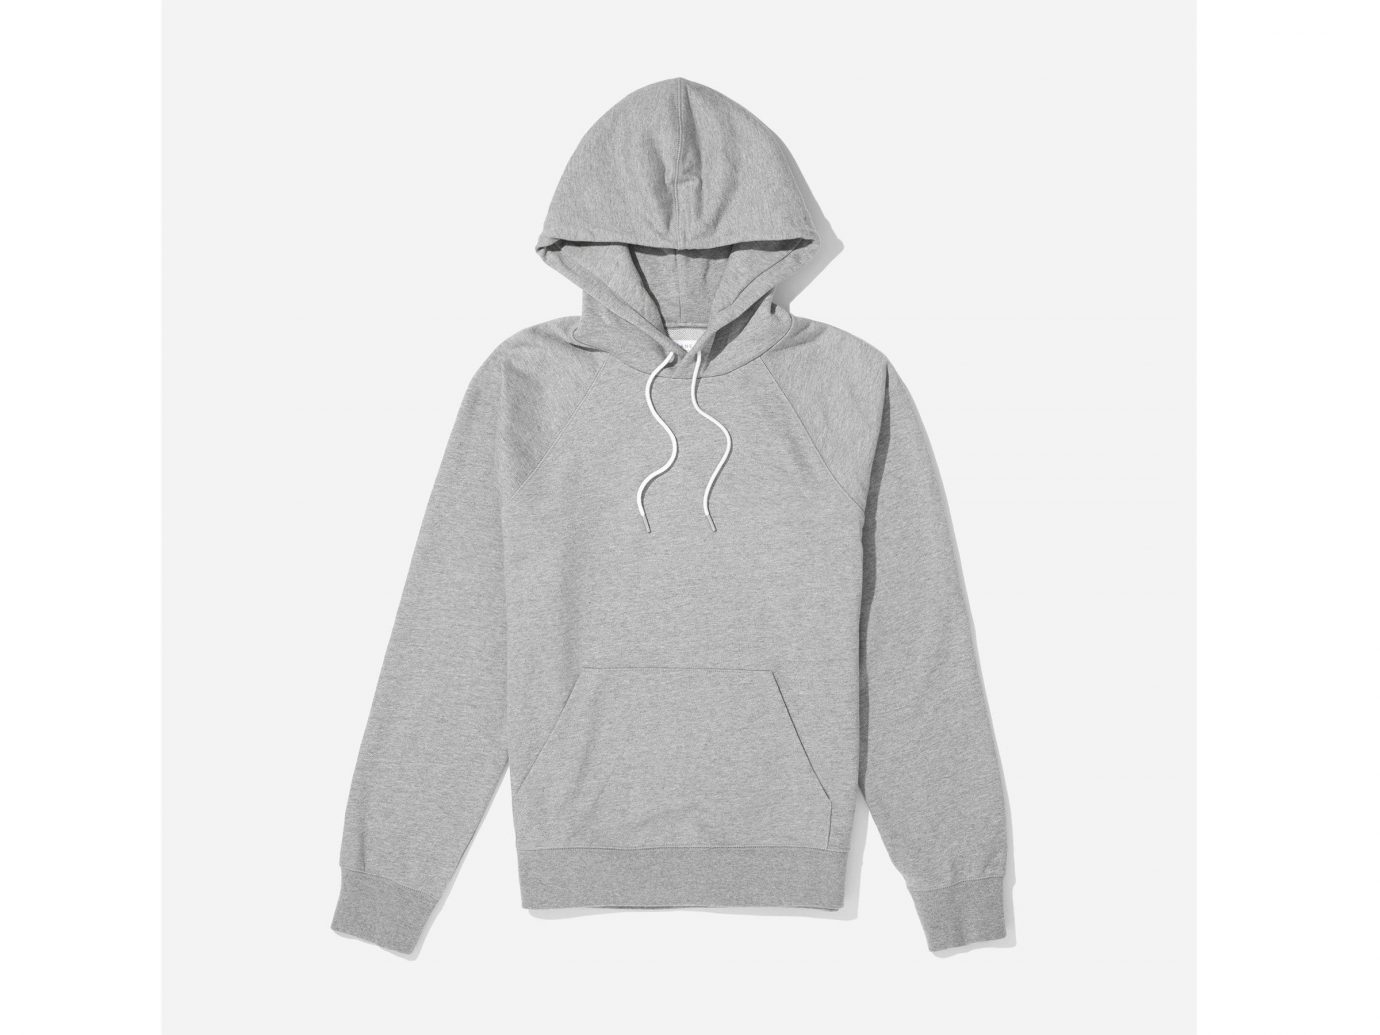 Style + Design Travel Shop hood hoodie clothing outerwear sweatshirt product sleeve neck woolen product design